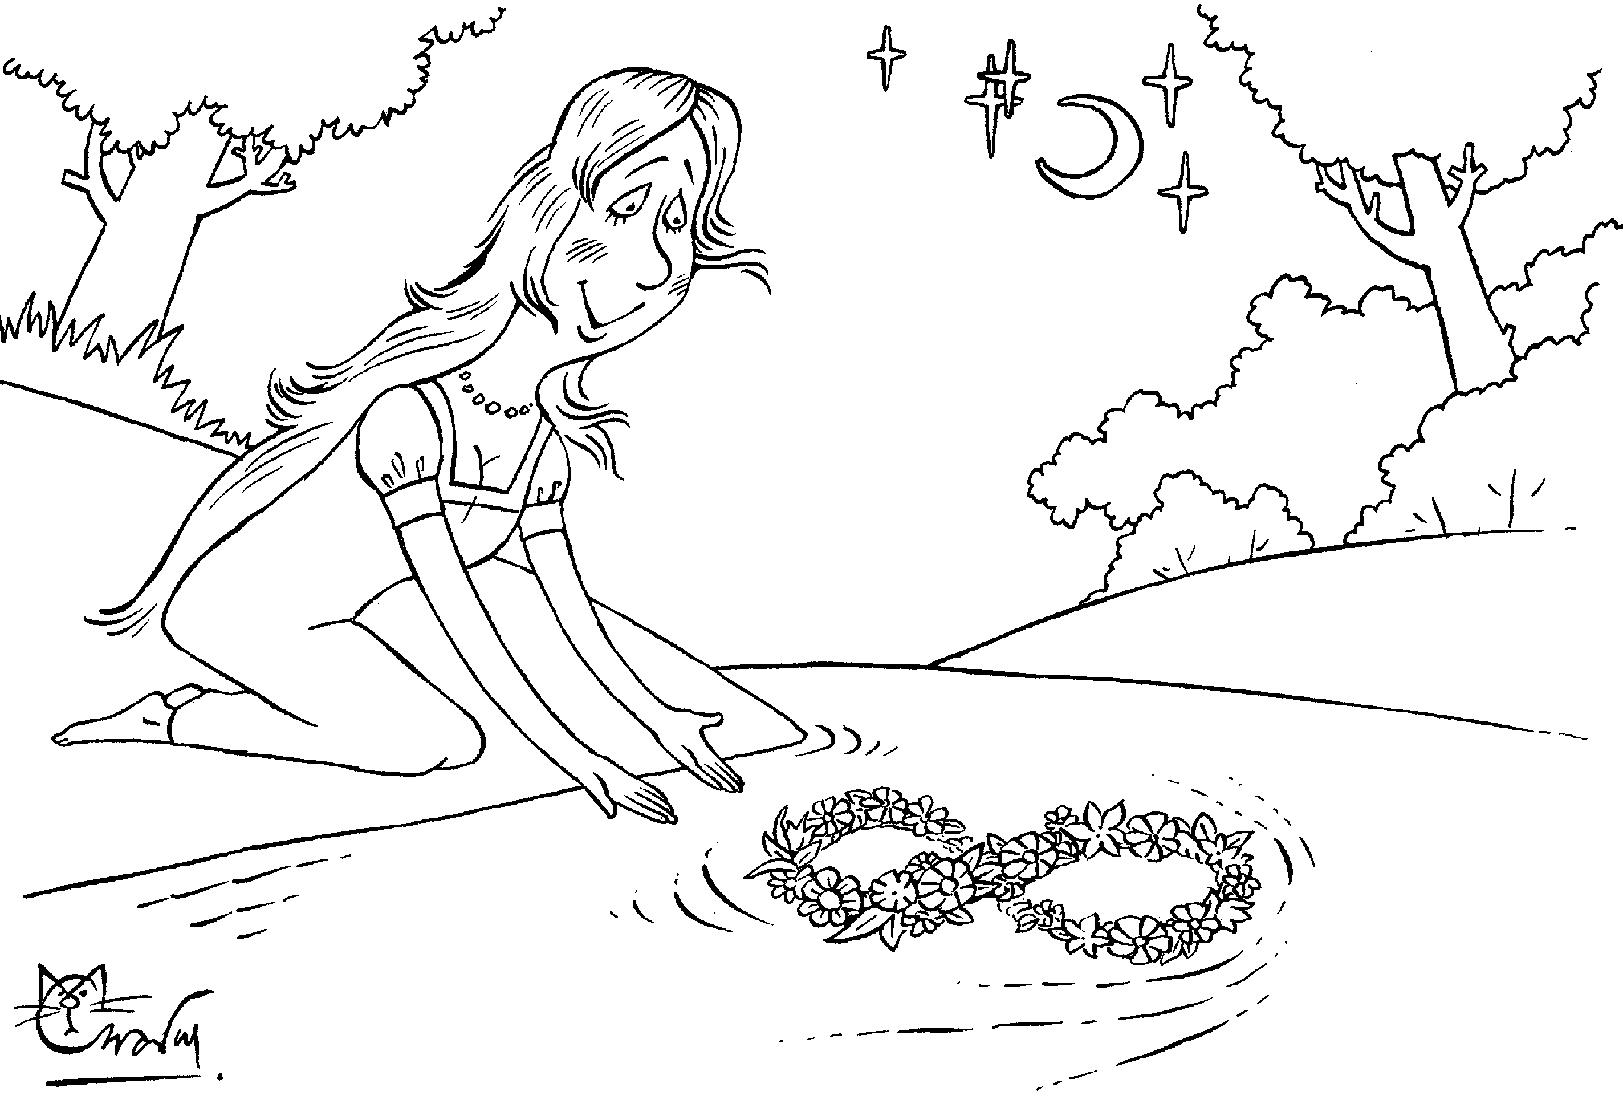 Праздник ивана купала рисунок карандашом